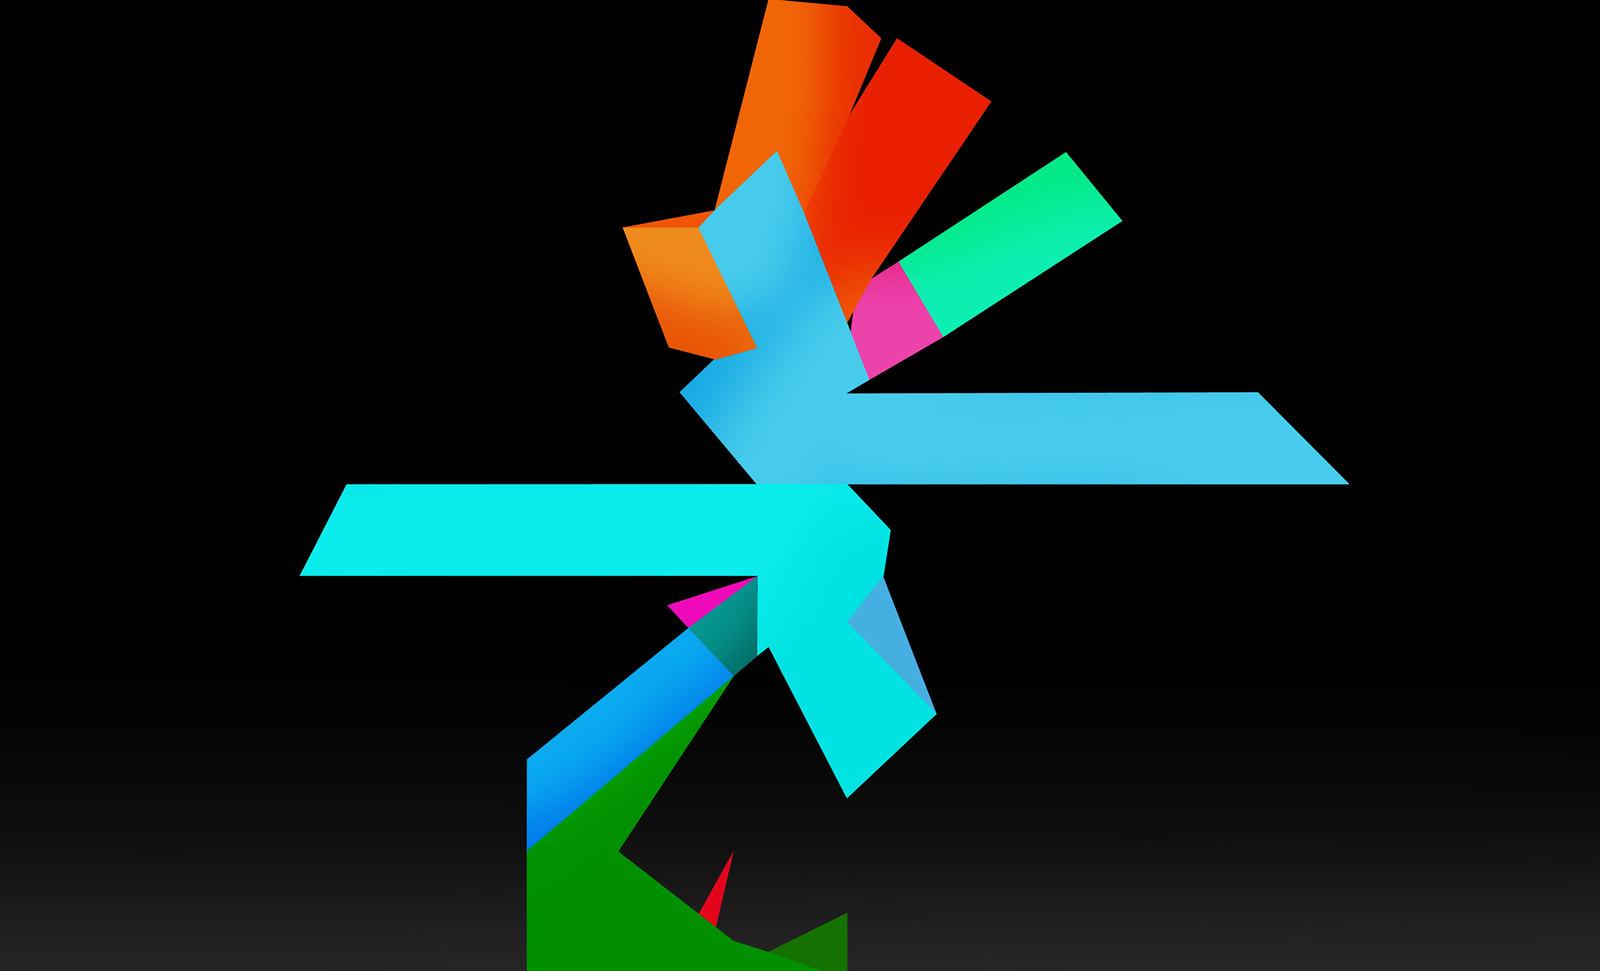 Escultura MAM mx 020